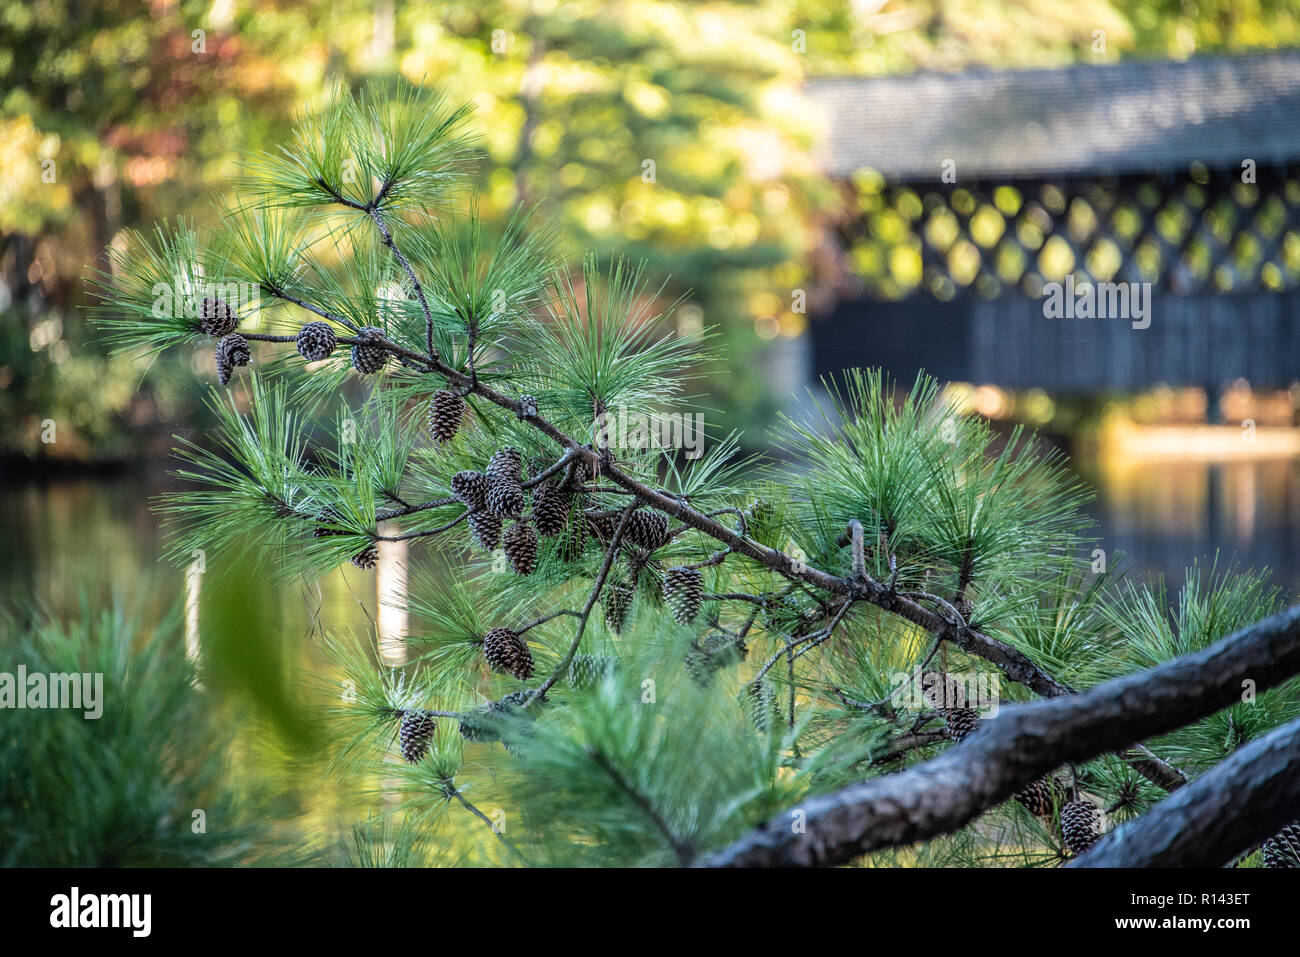 Pine branches loaded with pine cones near the covered bridge on Stone Mountain Lake in Atlanta, Georgia's Stone Mountain Park. (USA) - Stock Image